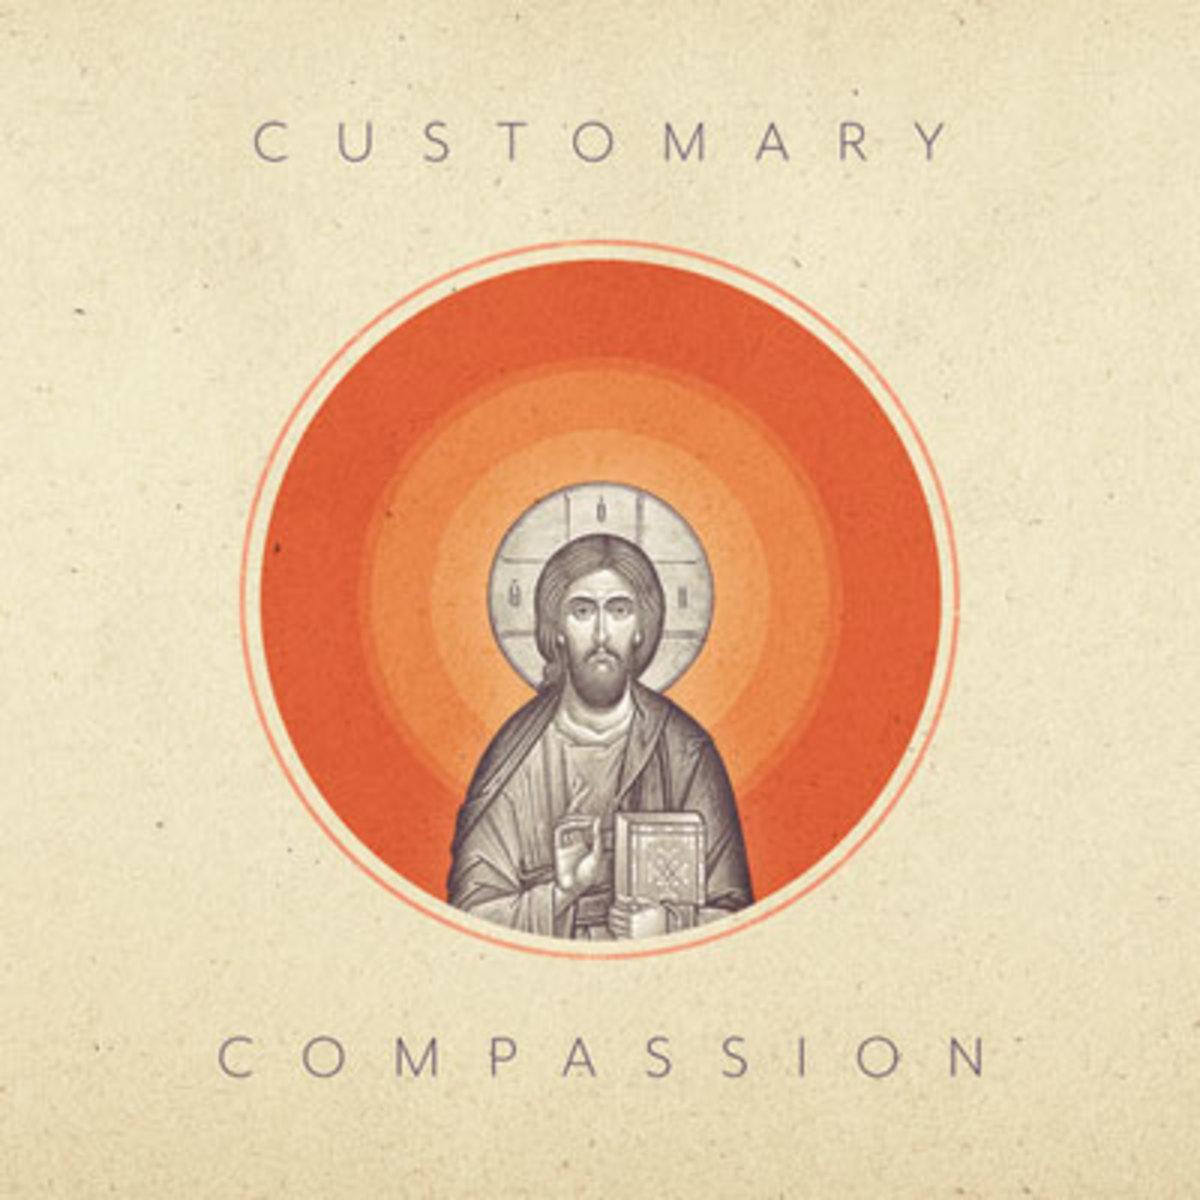 customary-compassion.jpg